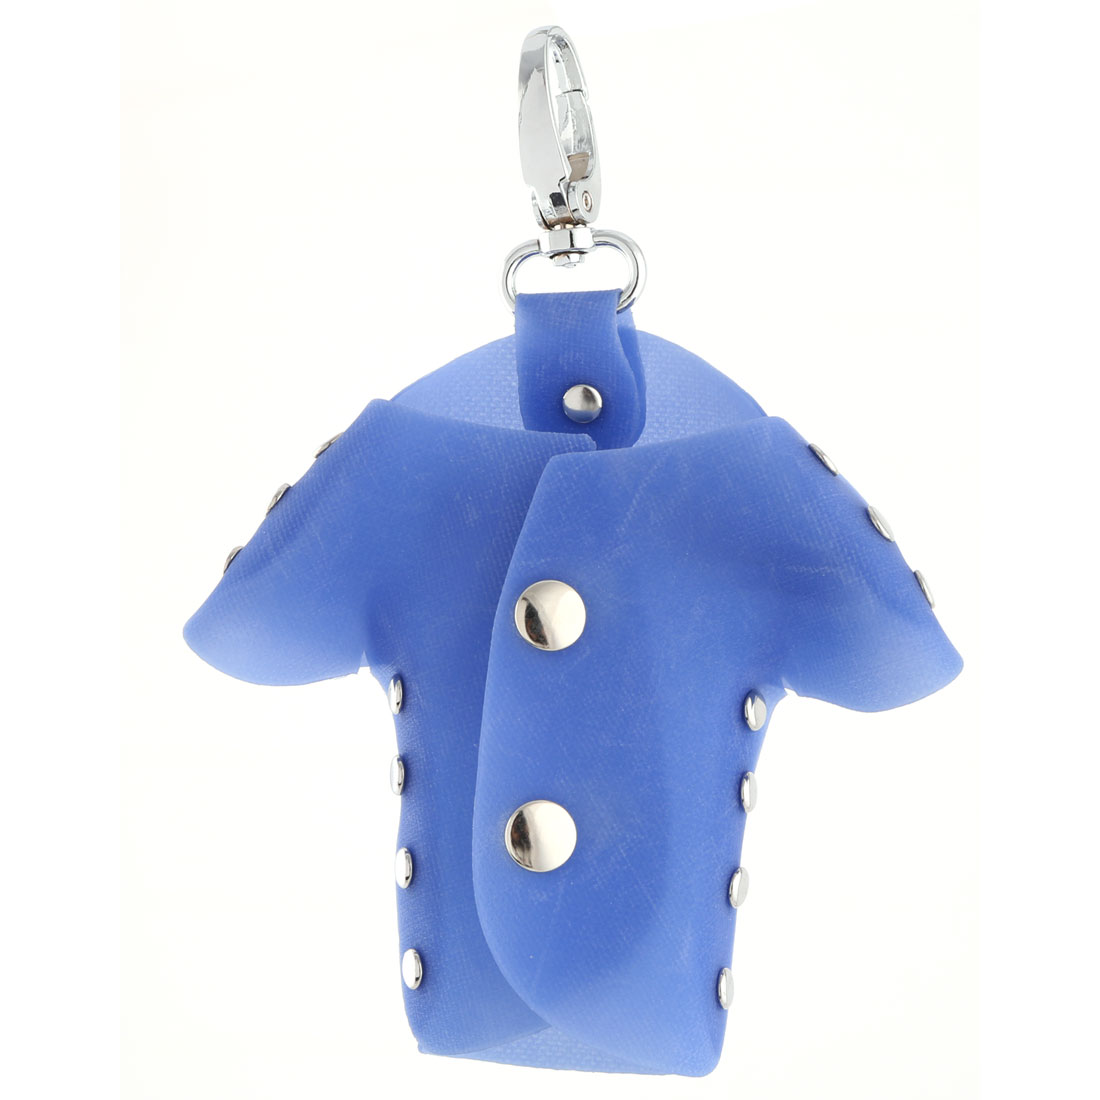 Plastic Cover Clothes Shape Six Metal Hooks Keys Holder Bag Silver Tone Blue